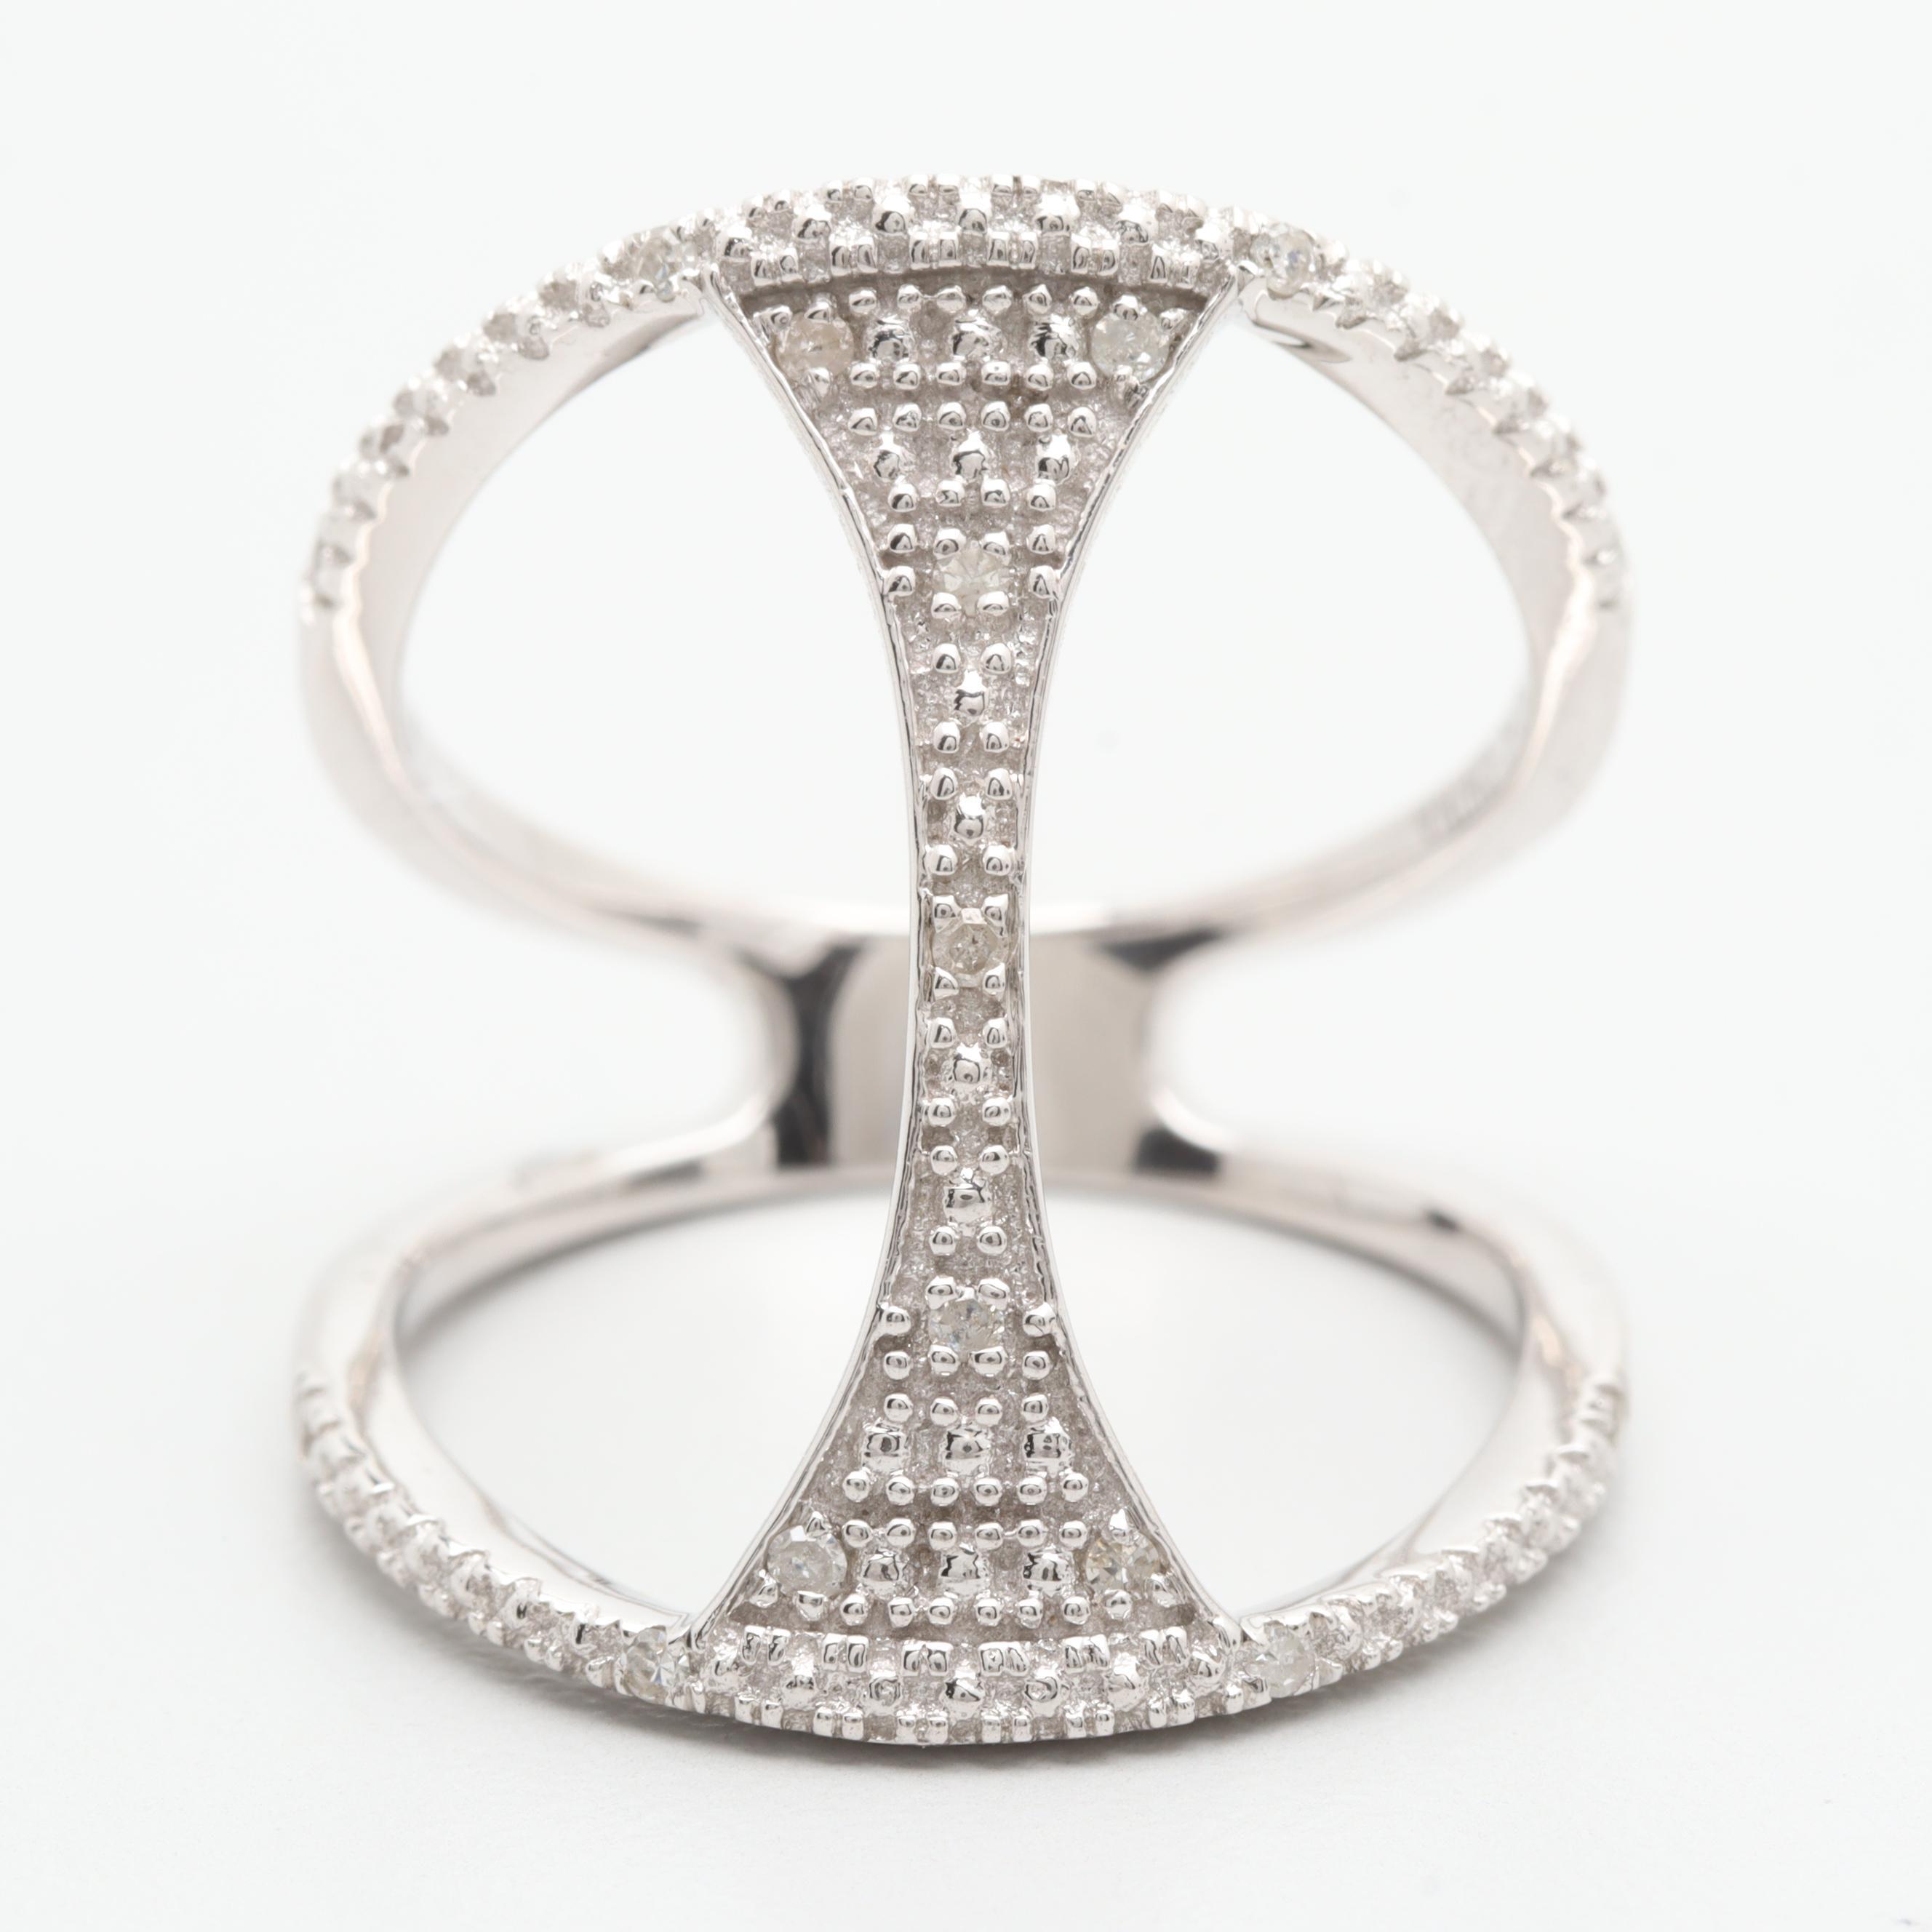 10K White Gold Diamond Openwork Ring